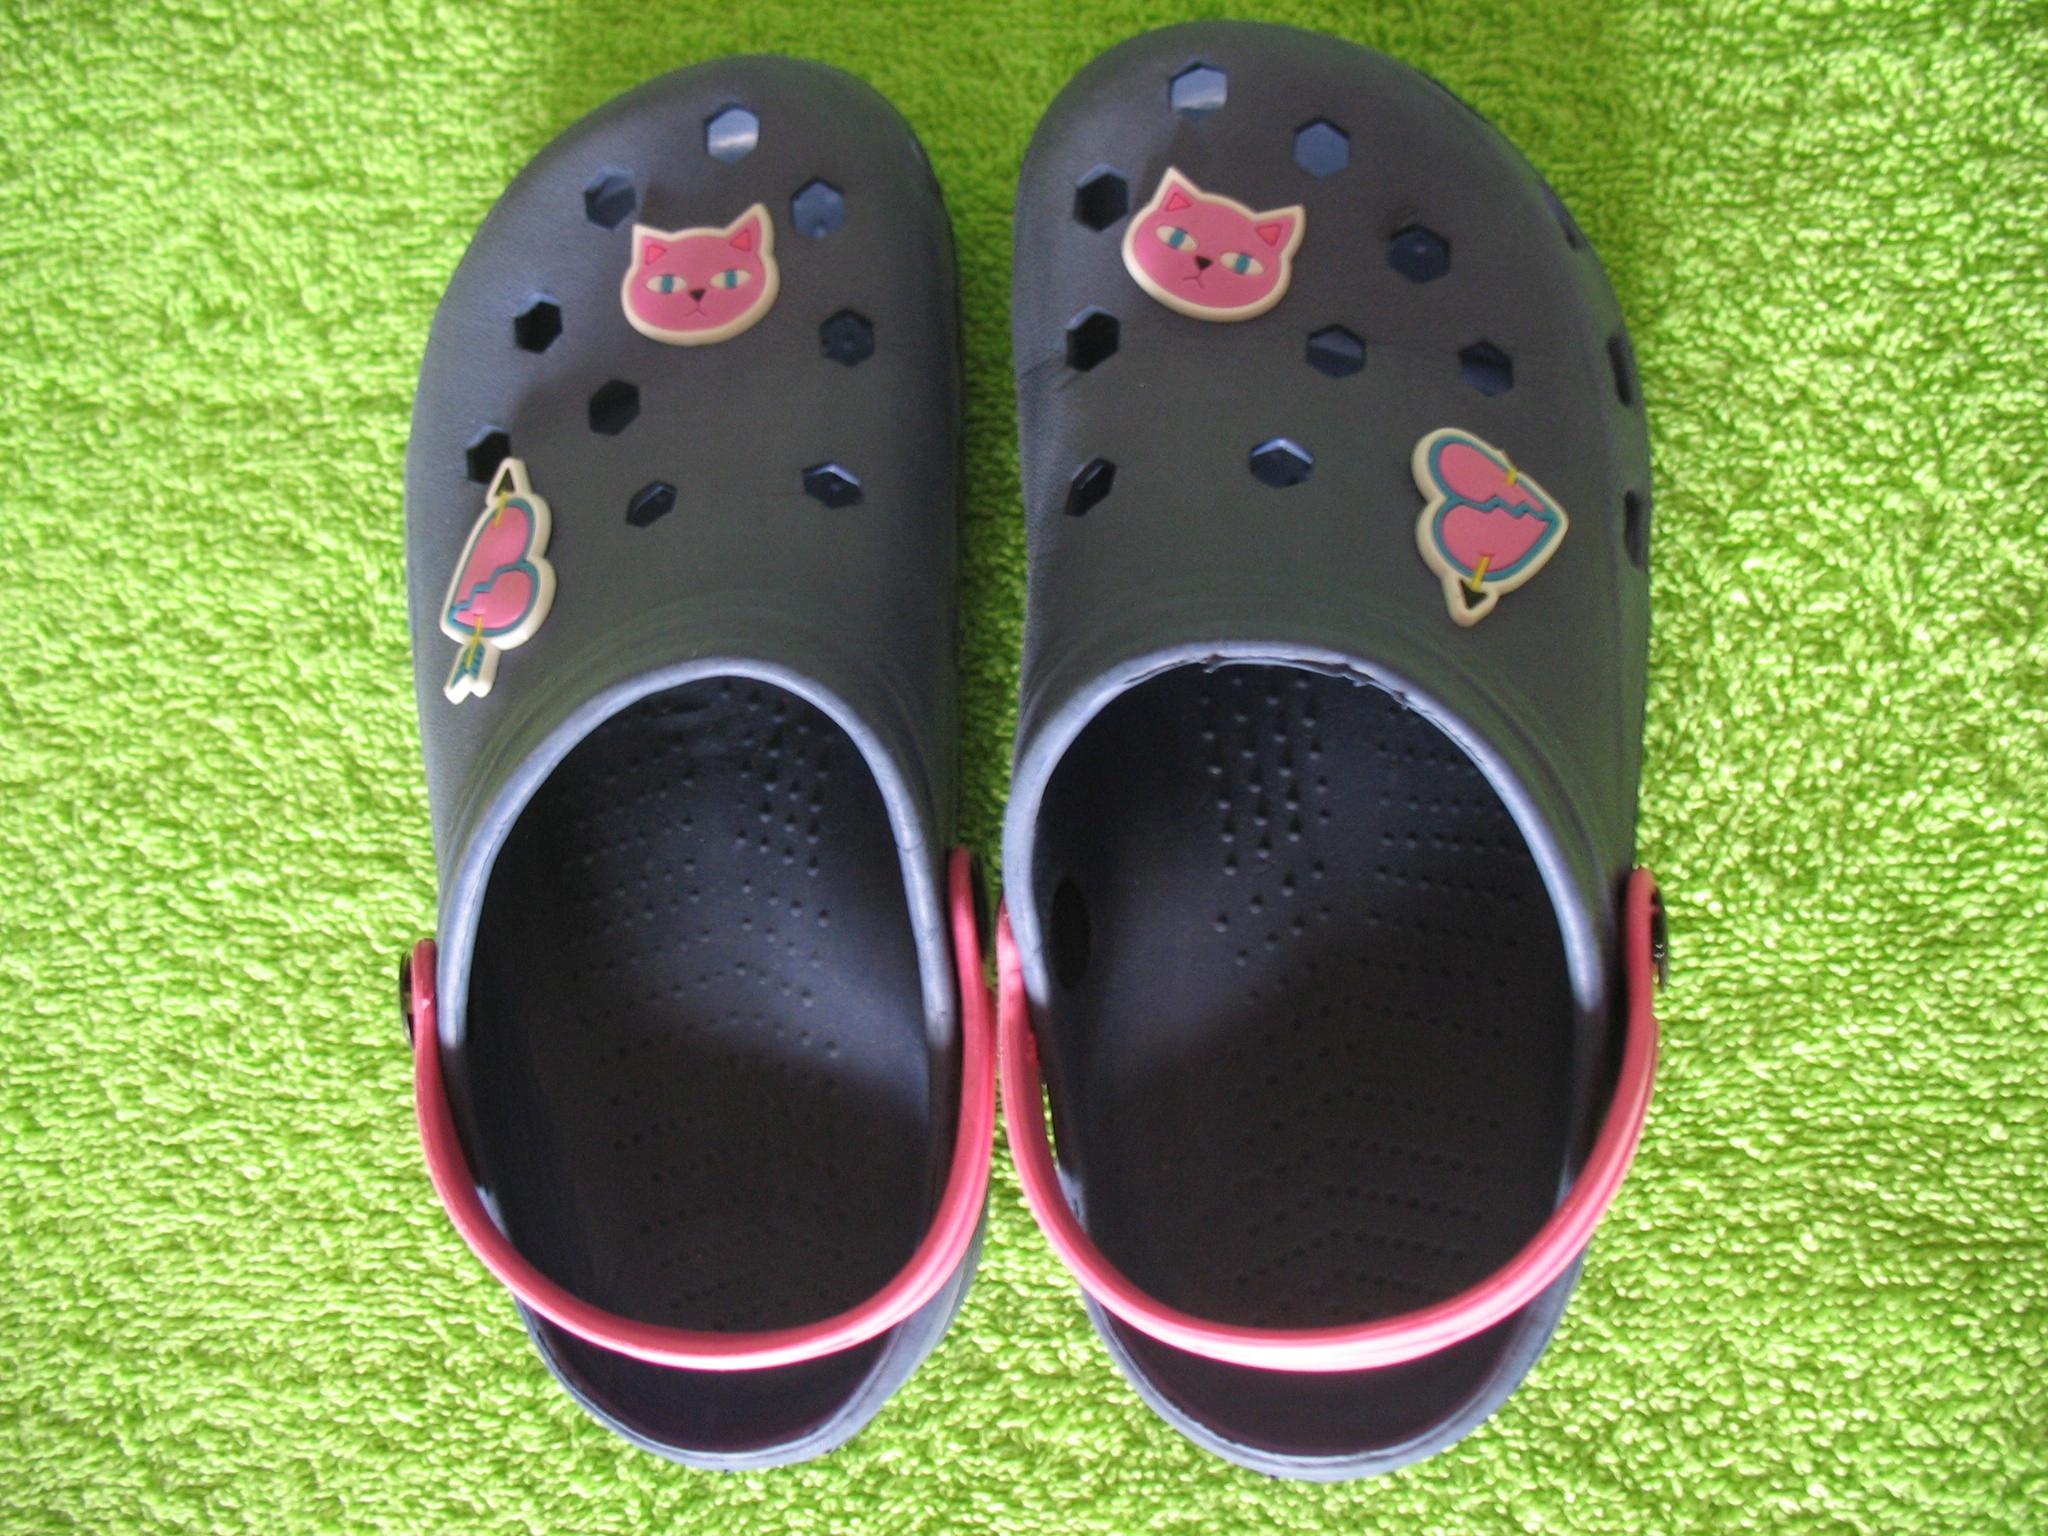 fd94b46ca44e2c Klapki typu crocs rozmiar 33 wkładka 20 cm PEPCO - 7889478186 ...